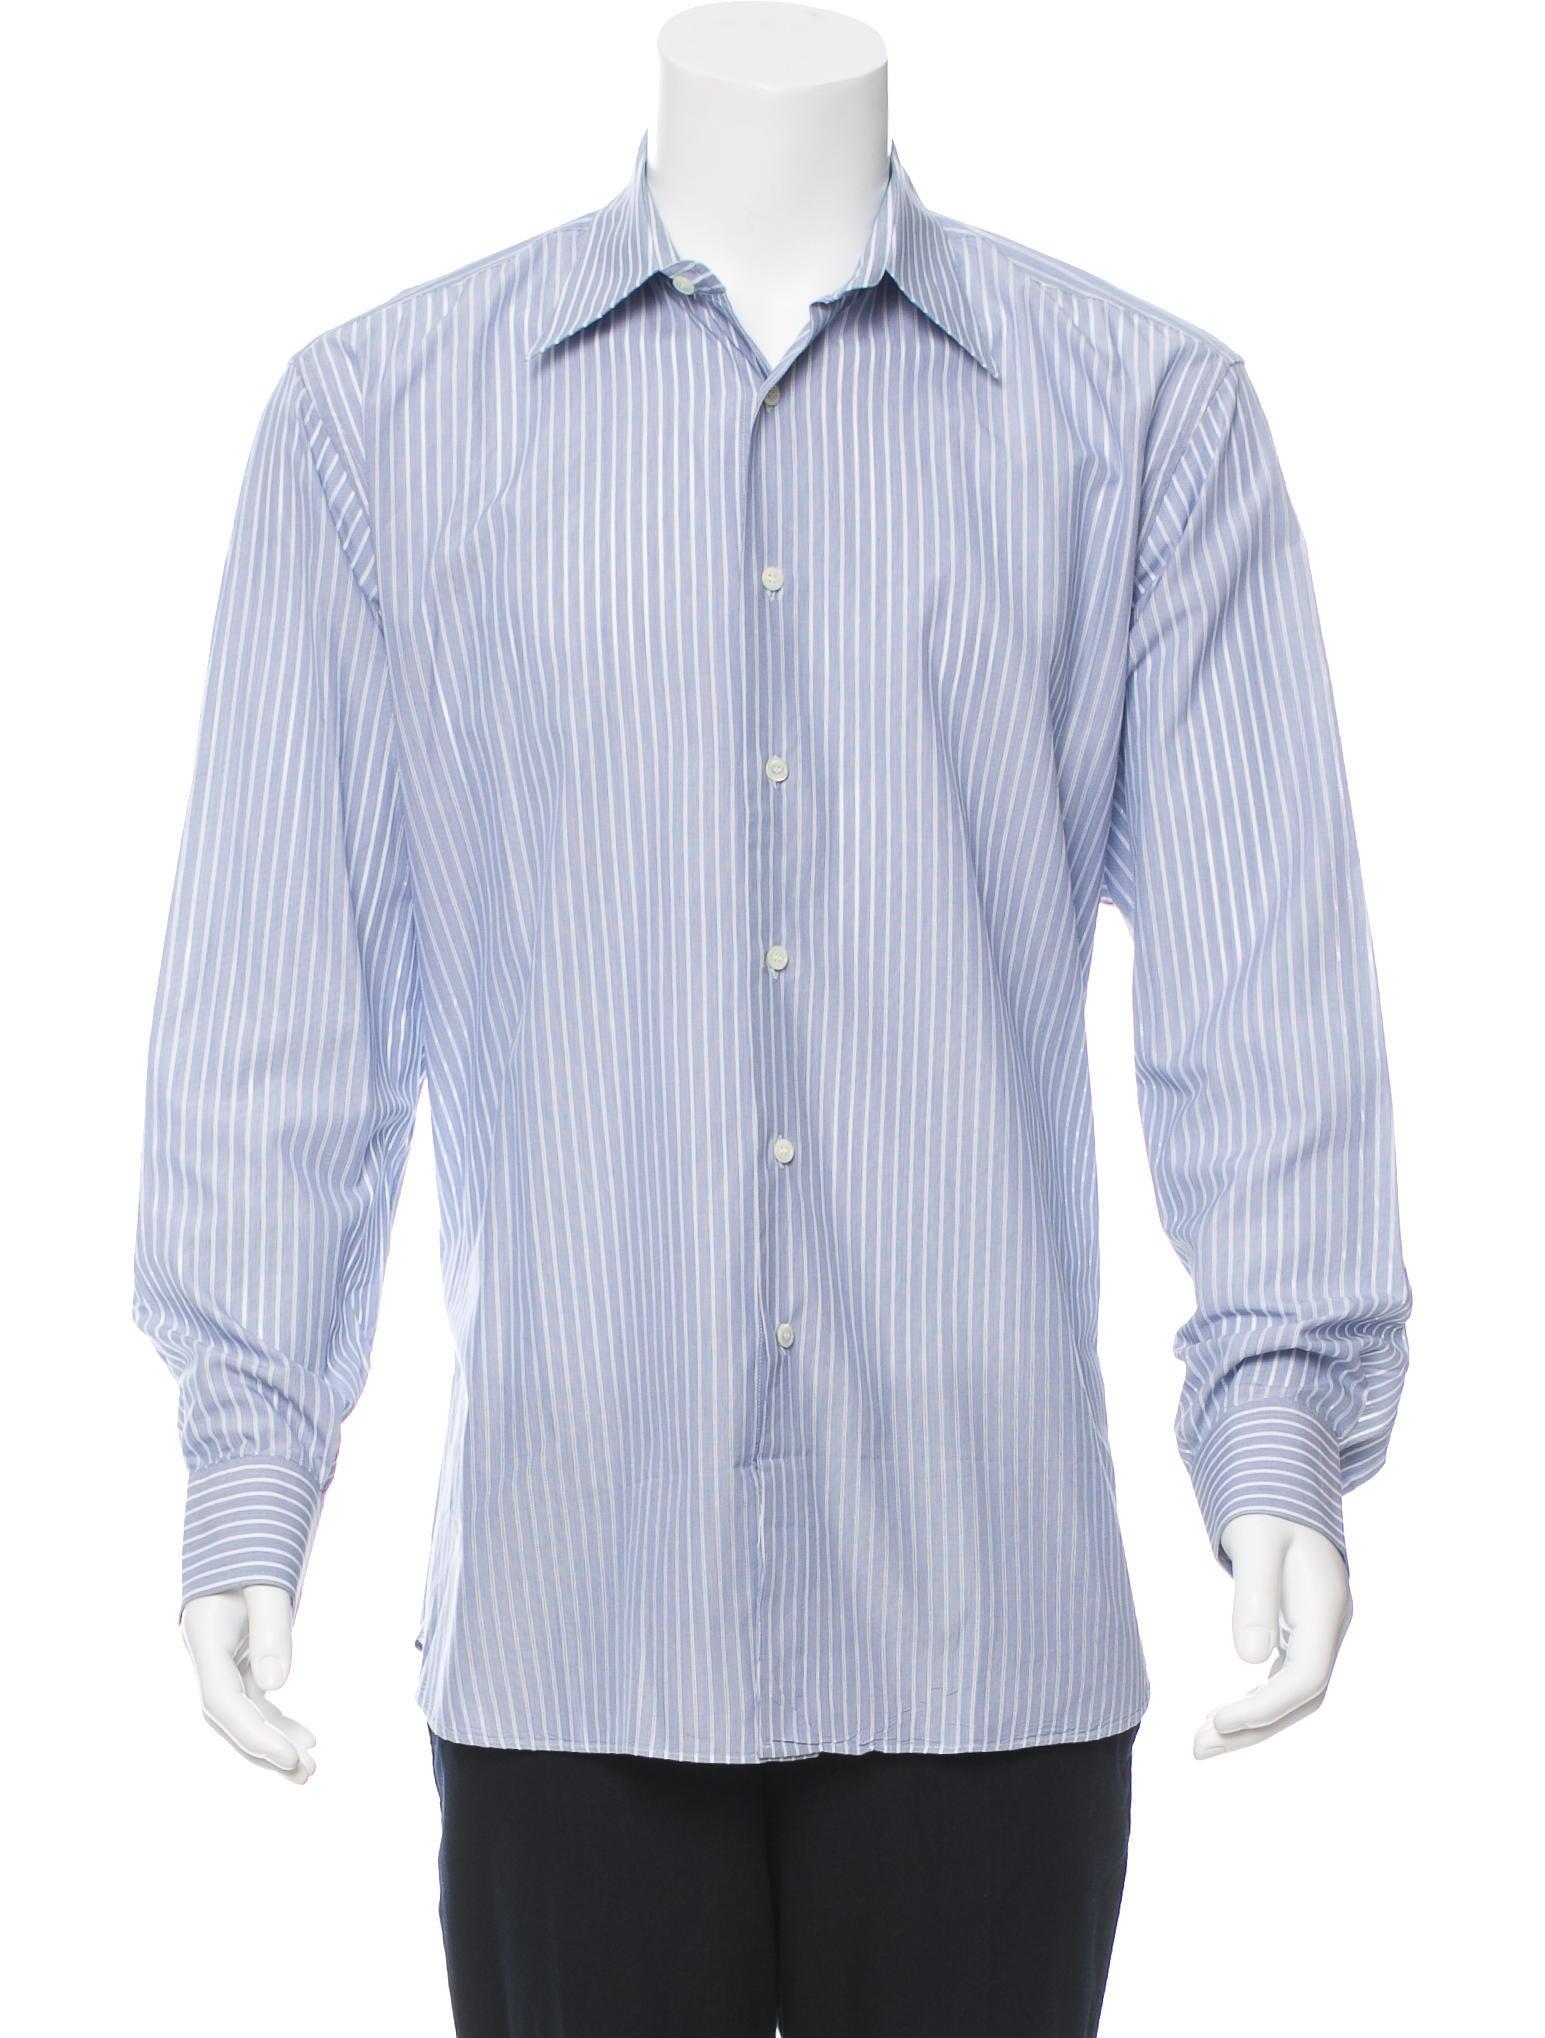 Salvatore Ferragamo Striped Button Up Shirt Clothing